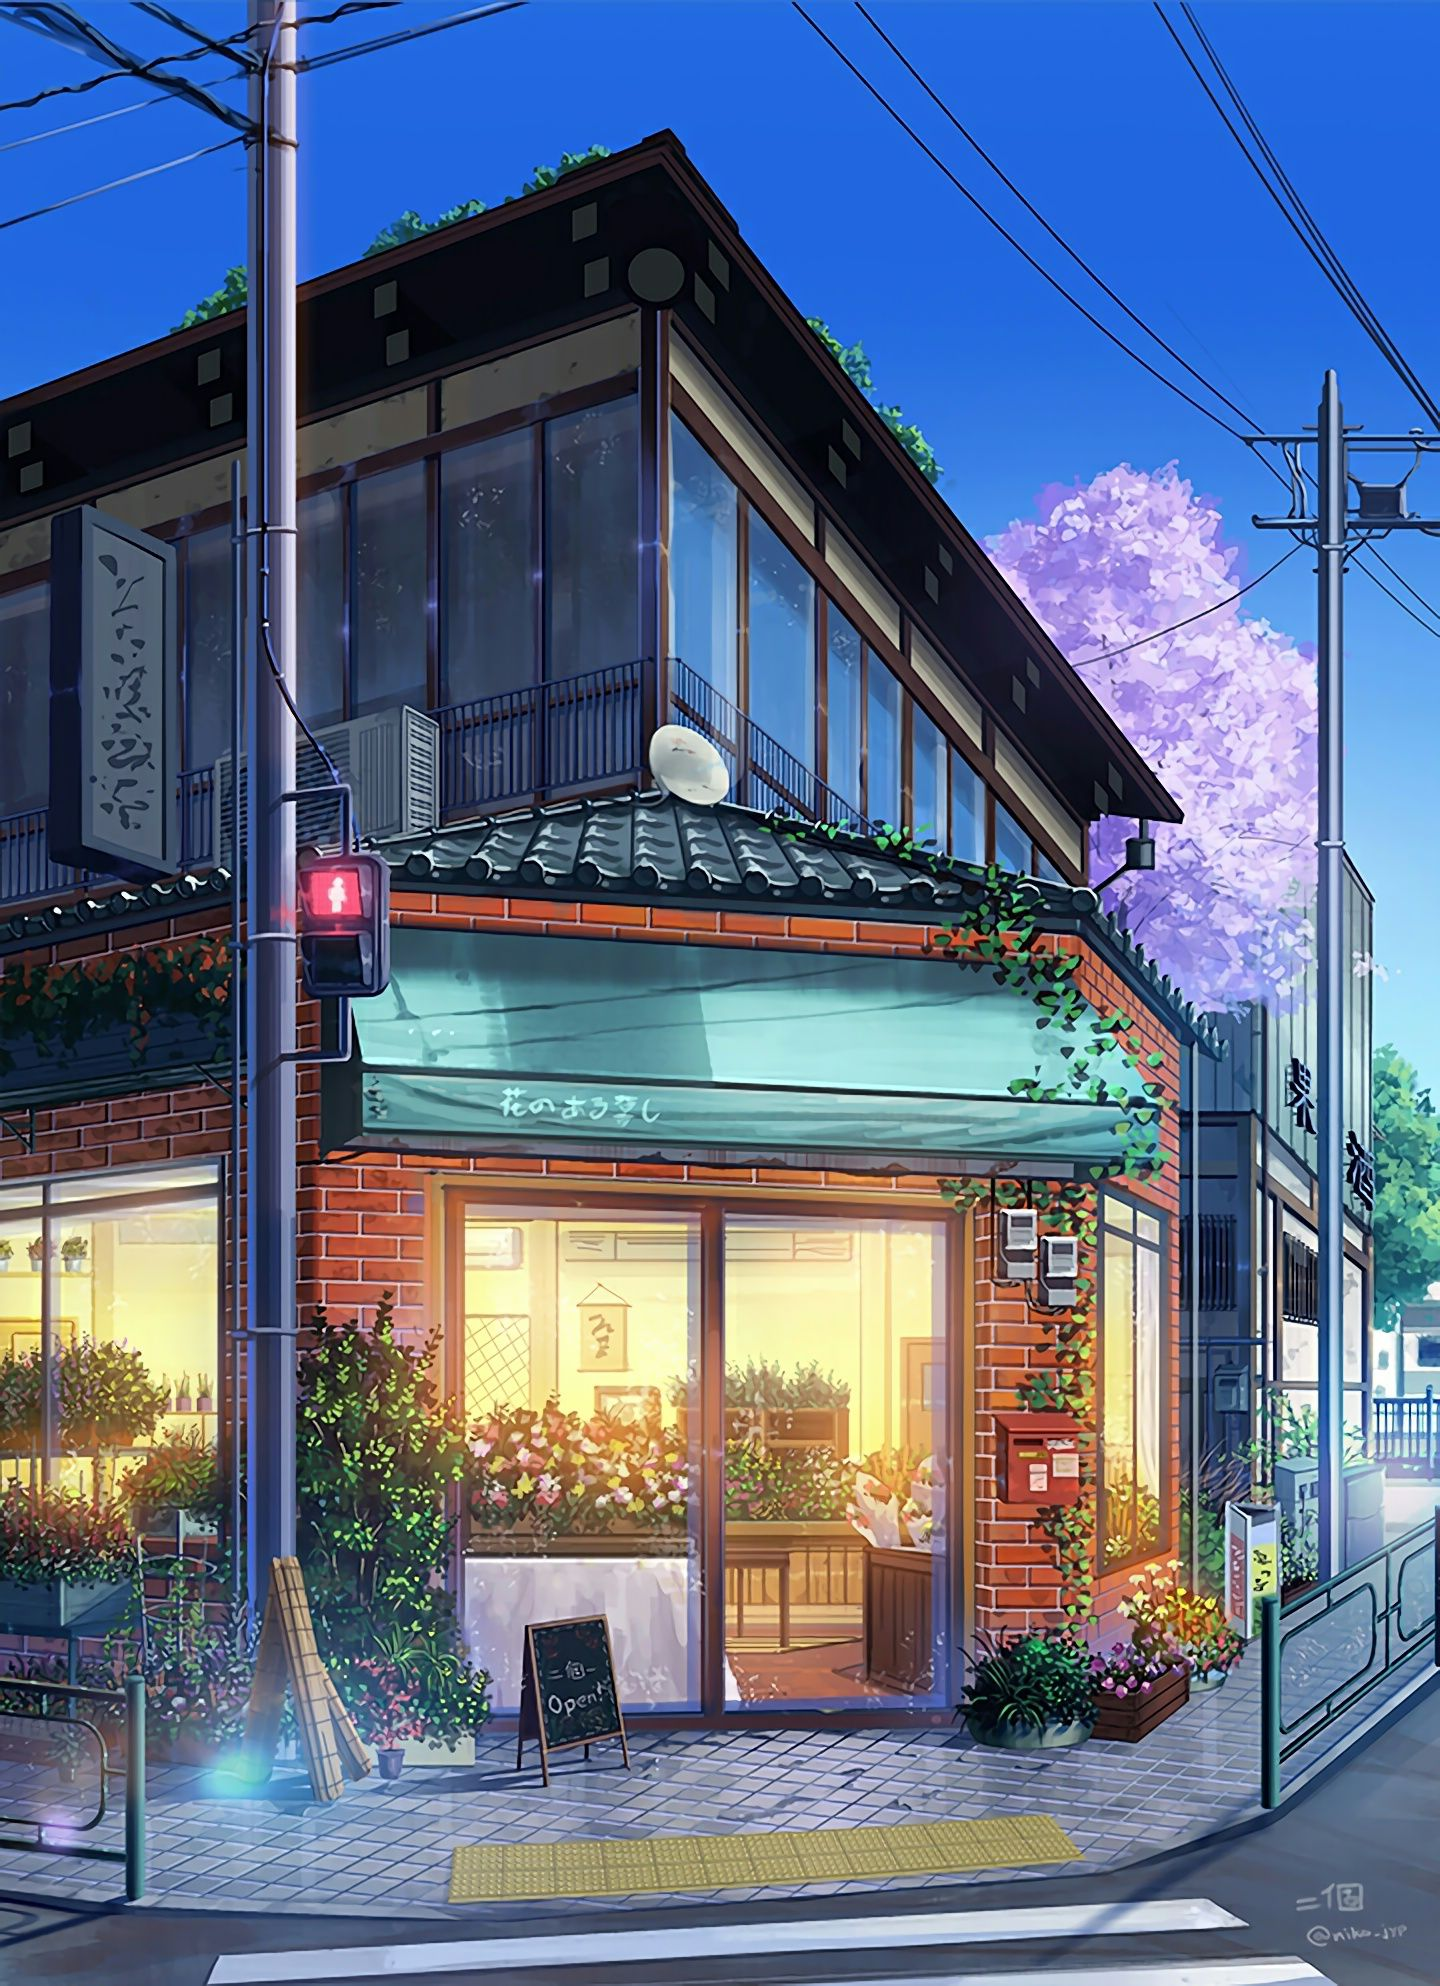 Corner florist shop japan art anime scenery anime